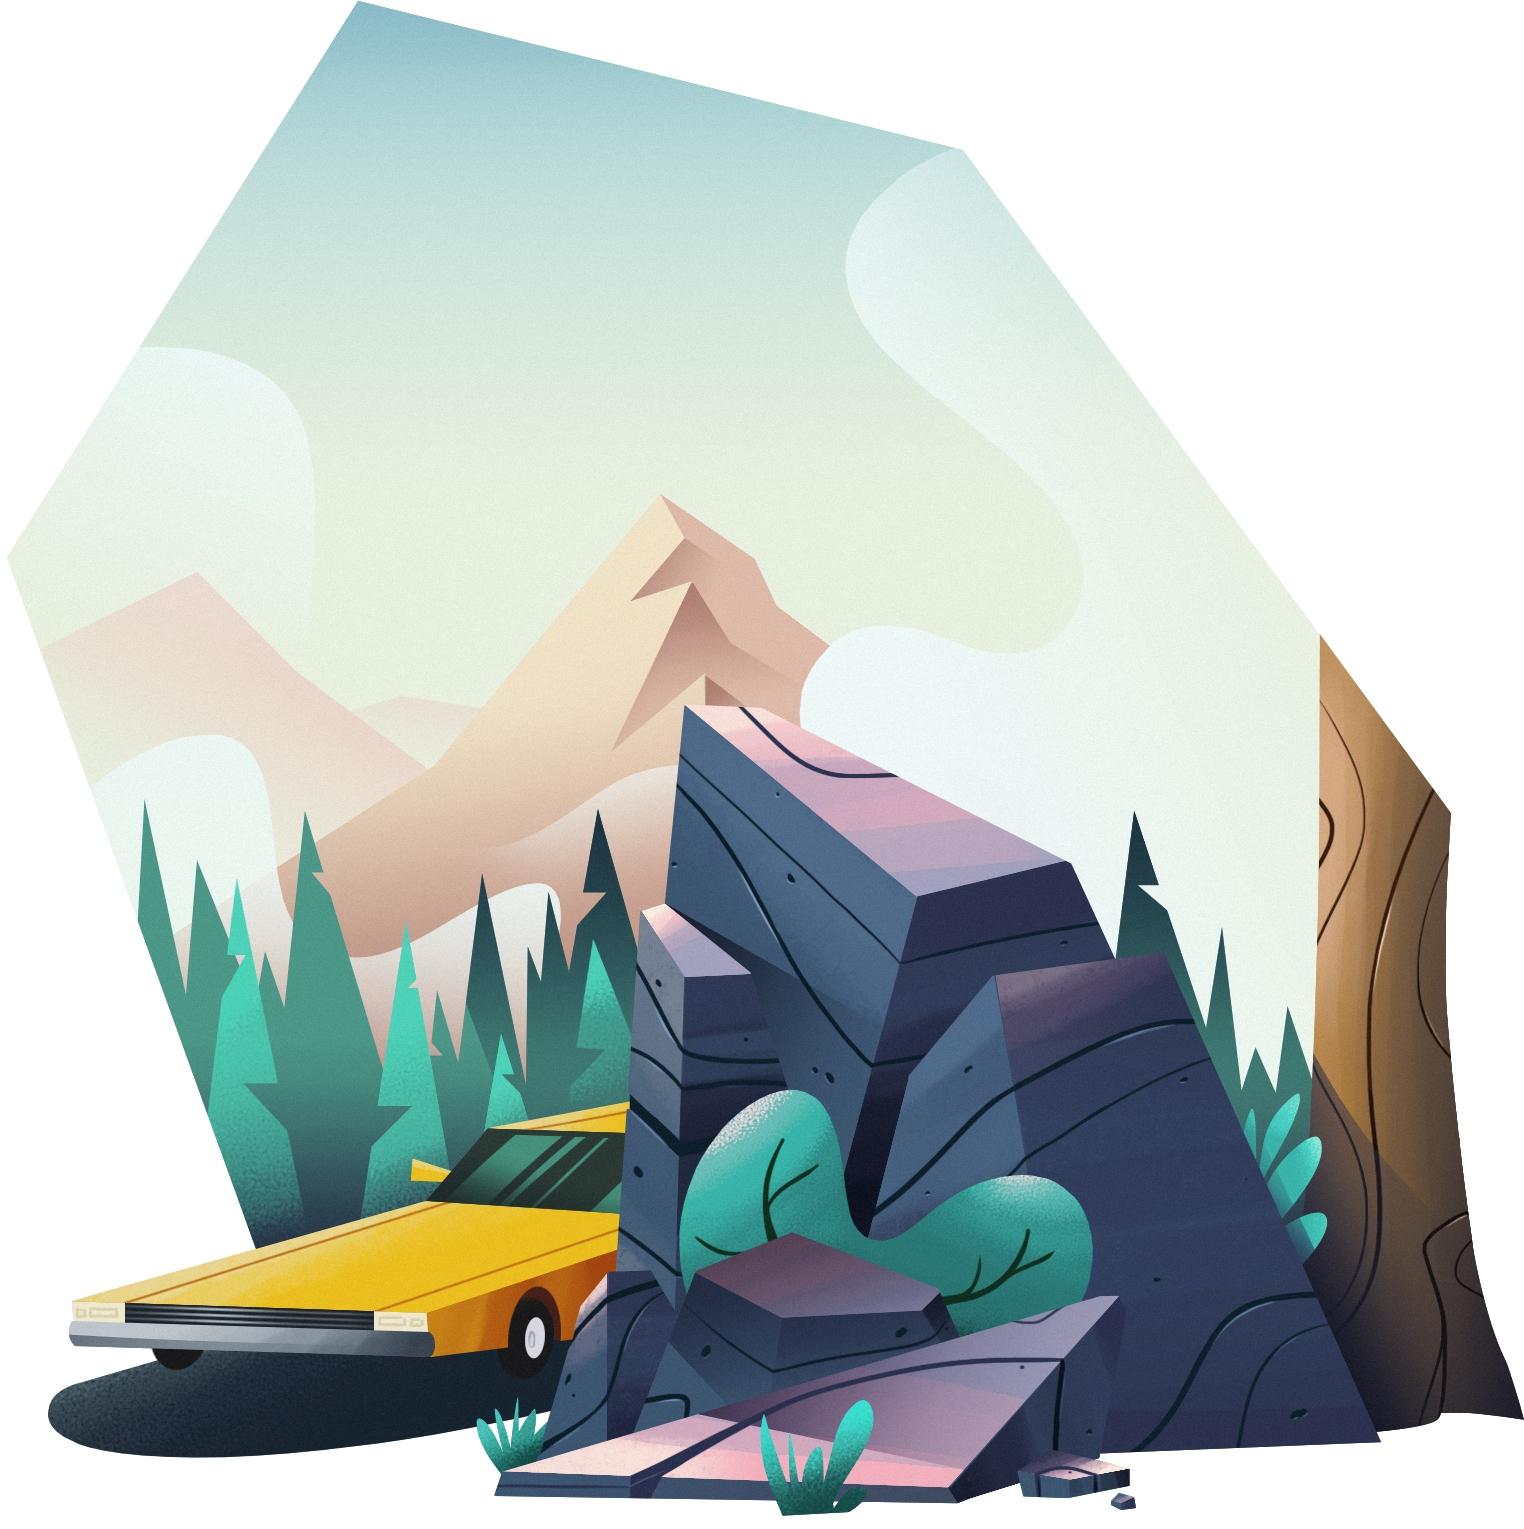 Roadtrip - illustration, camping - maximebourgeois | ello